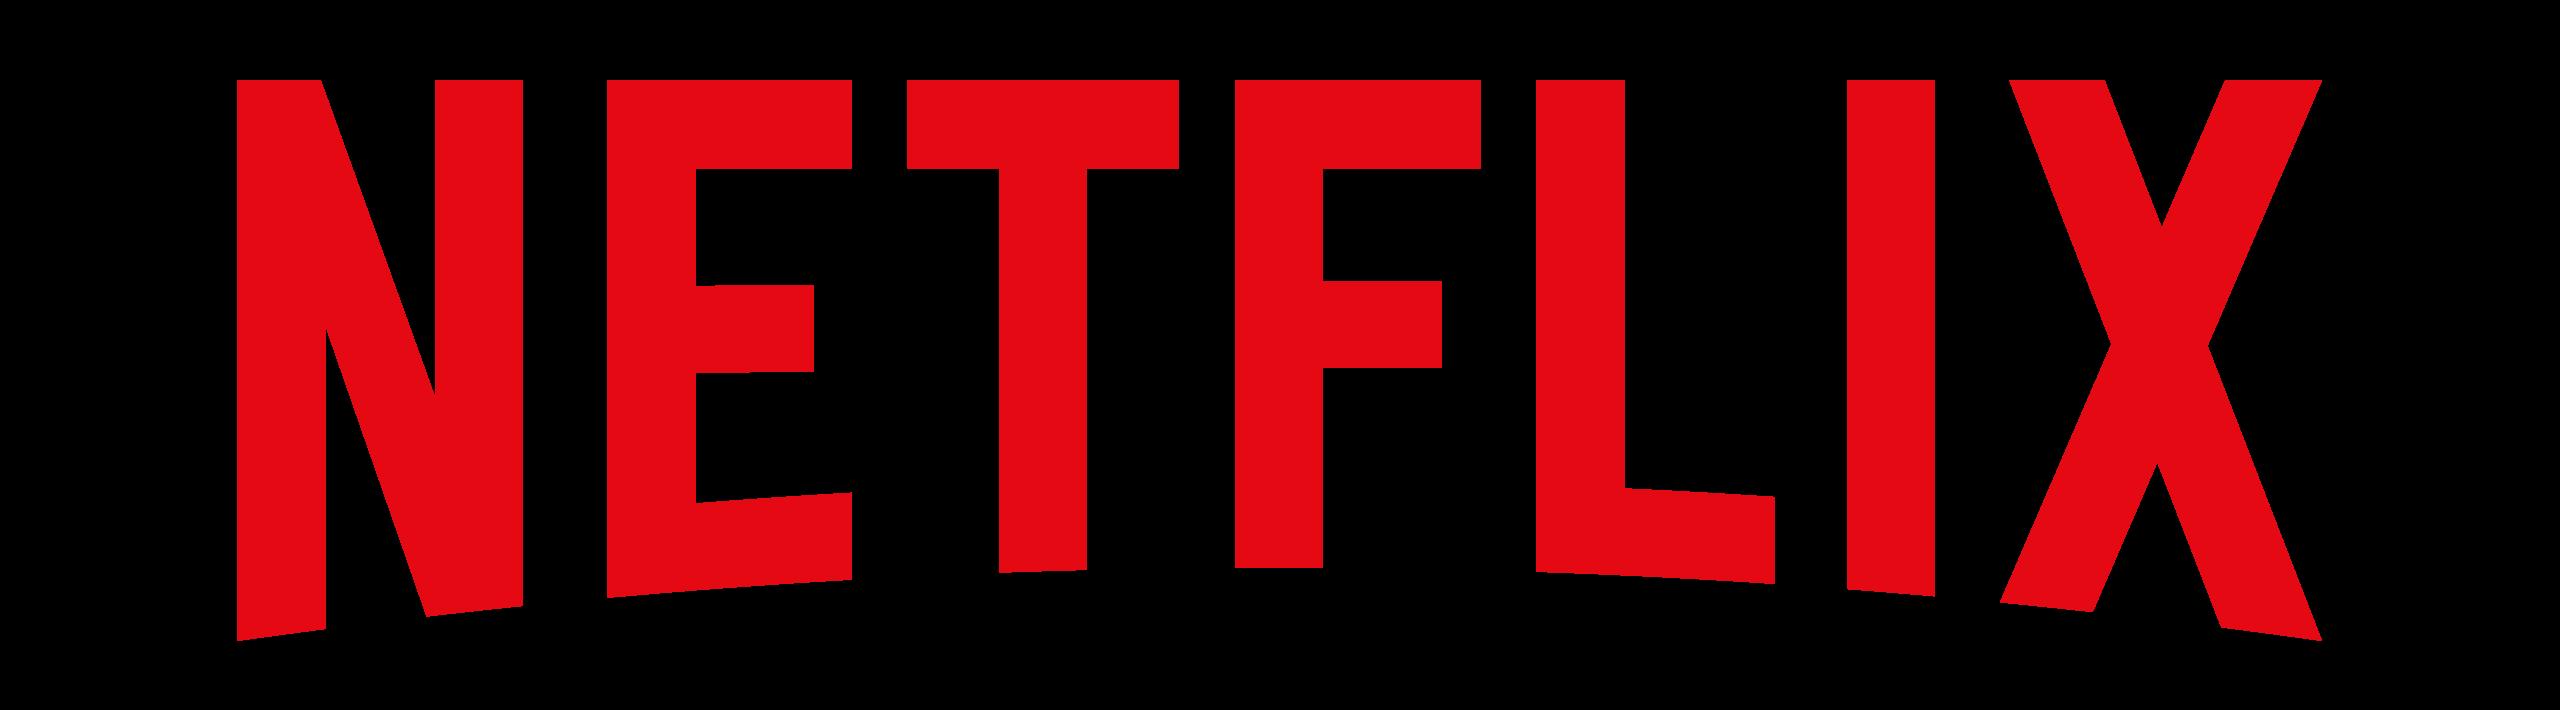 netflix logo history #2583